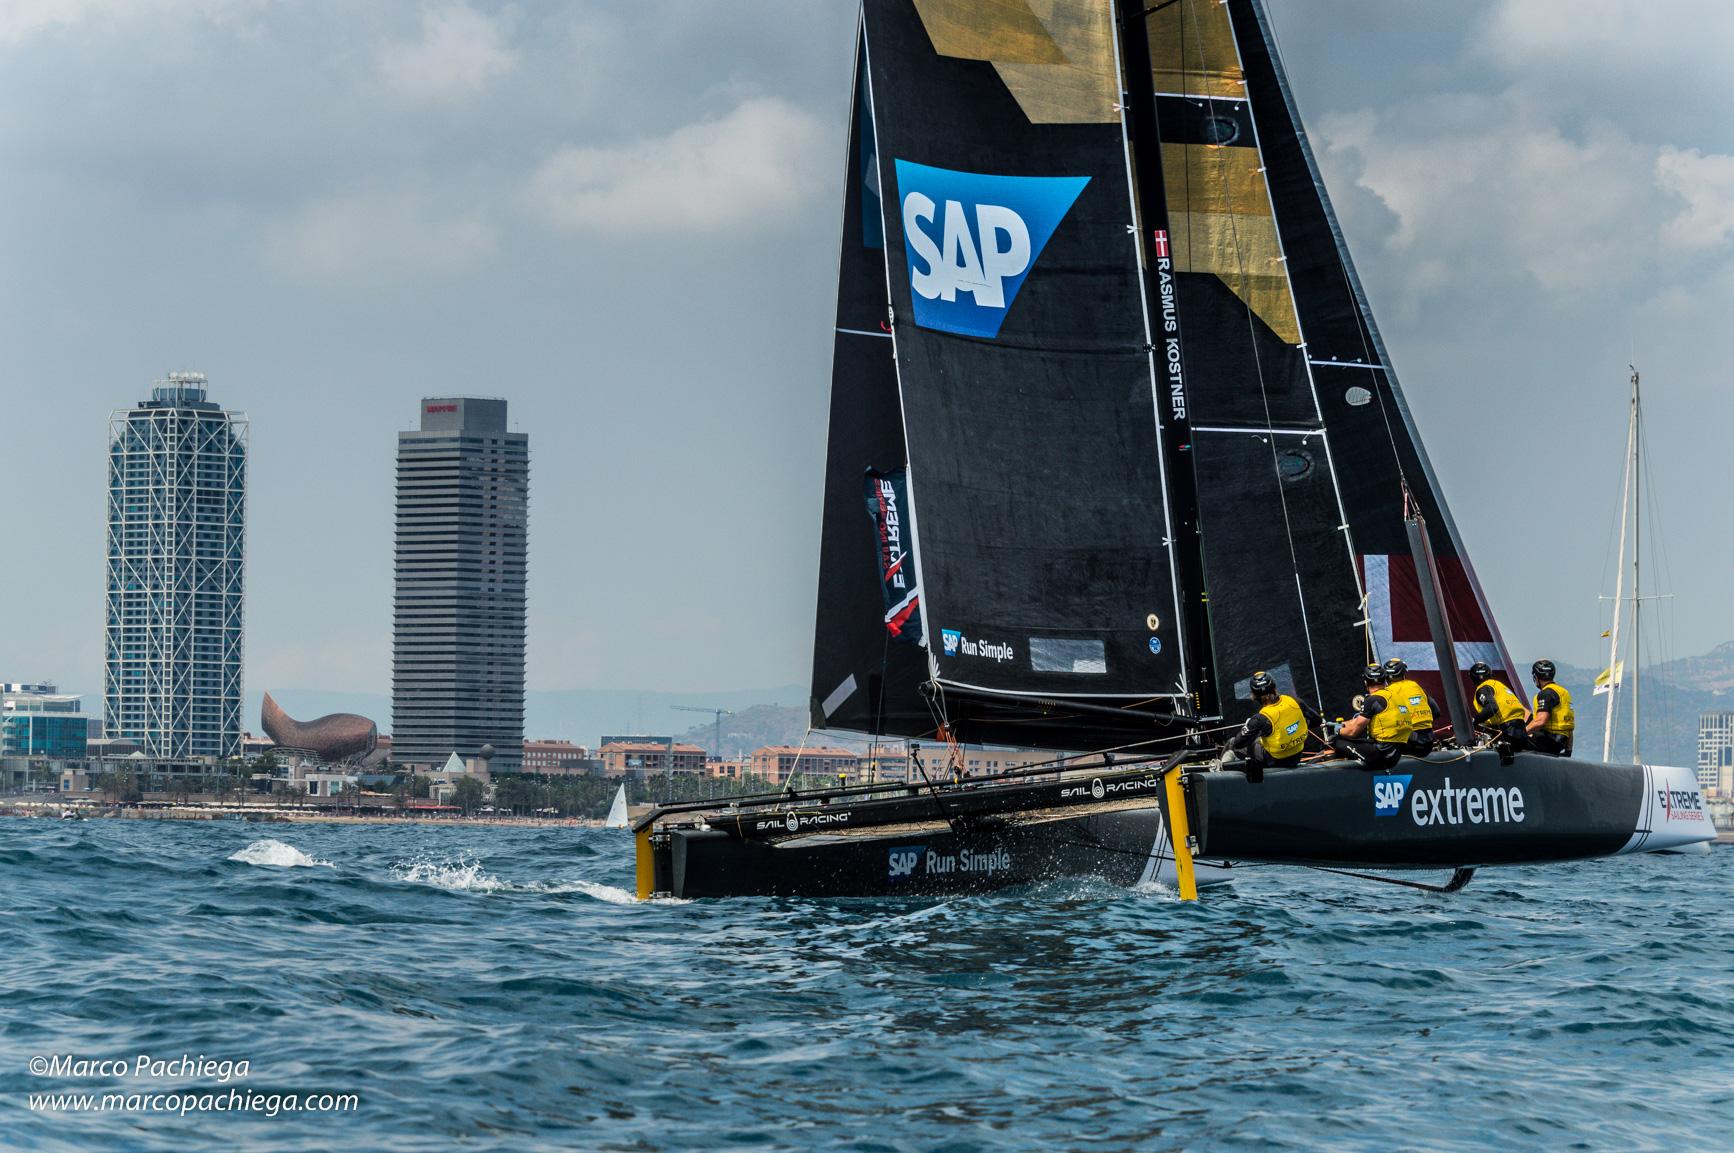 Extreme Sailing Seriers 2017 Barcellona, eventi, sport, notizie